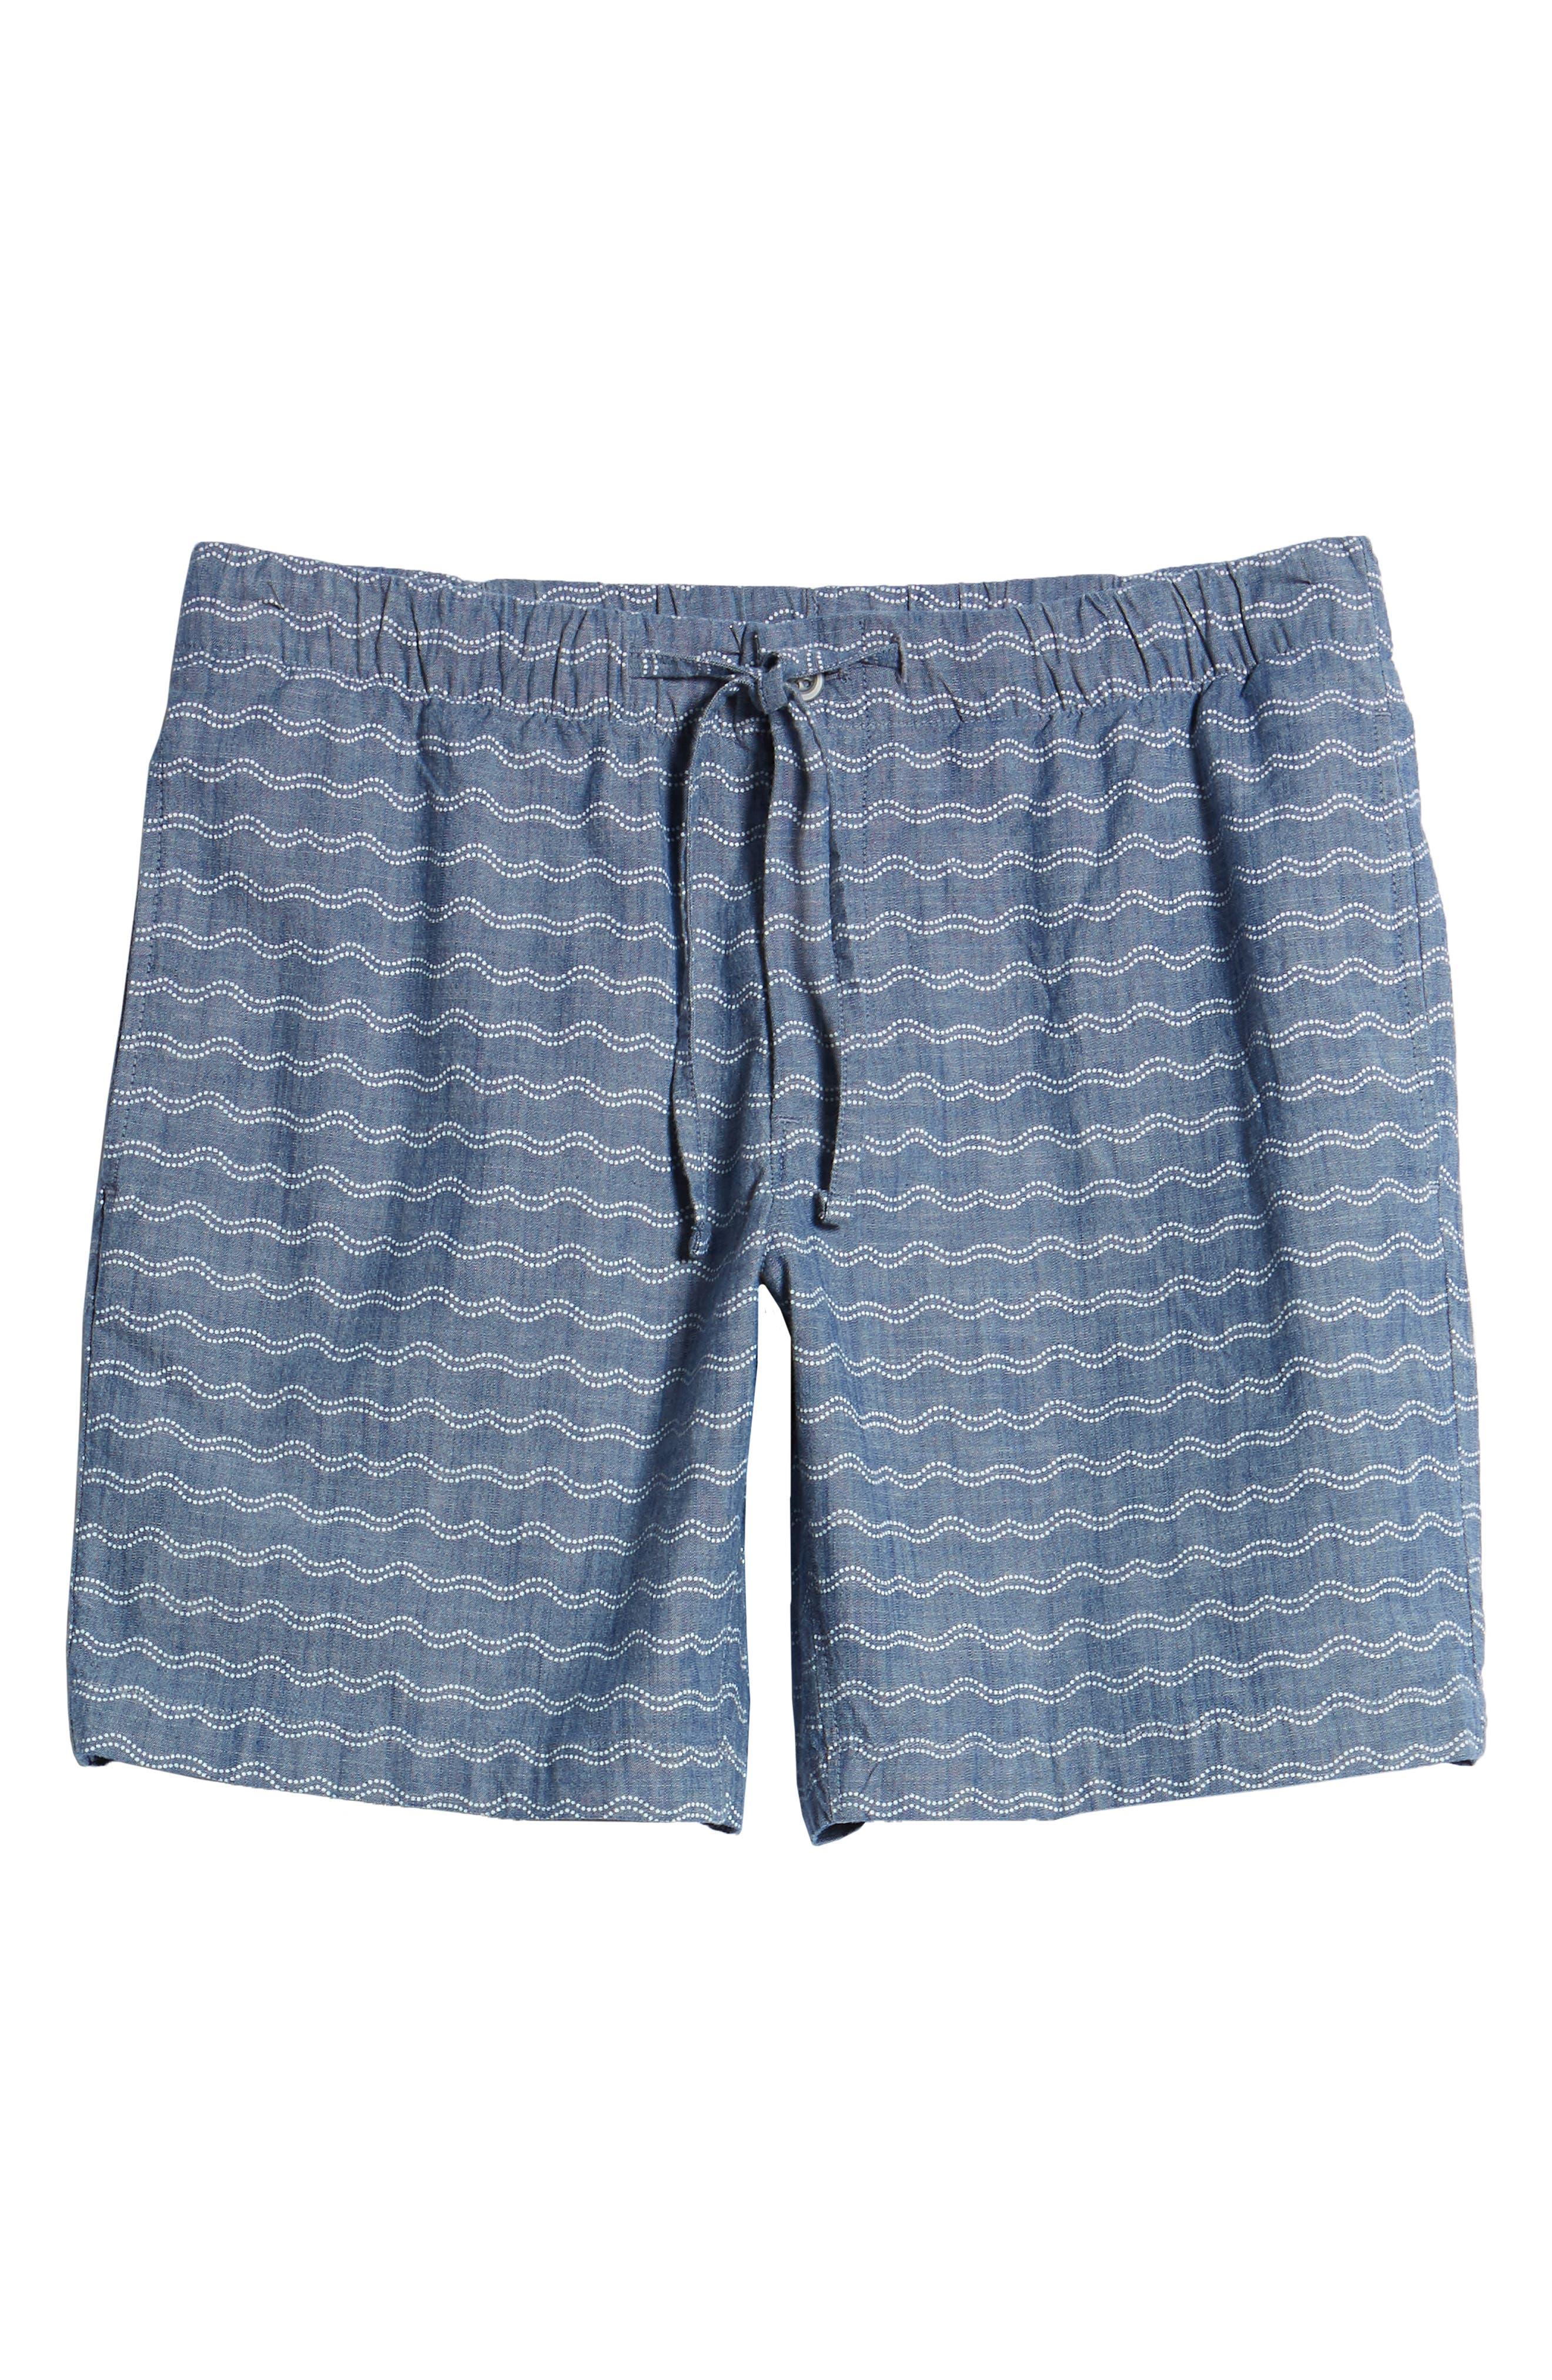 Print Beach Shorts,                             Alternate thumbnail 6, color,                             400